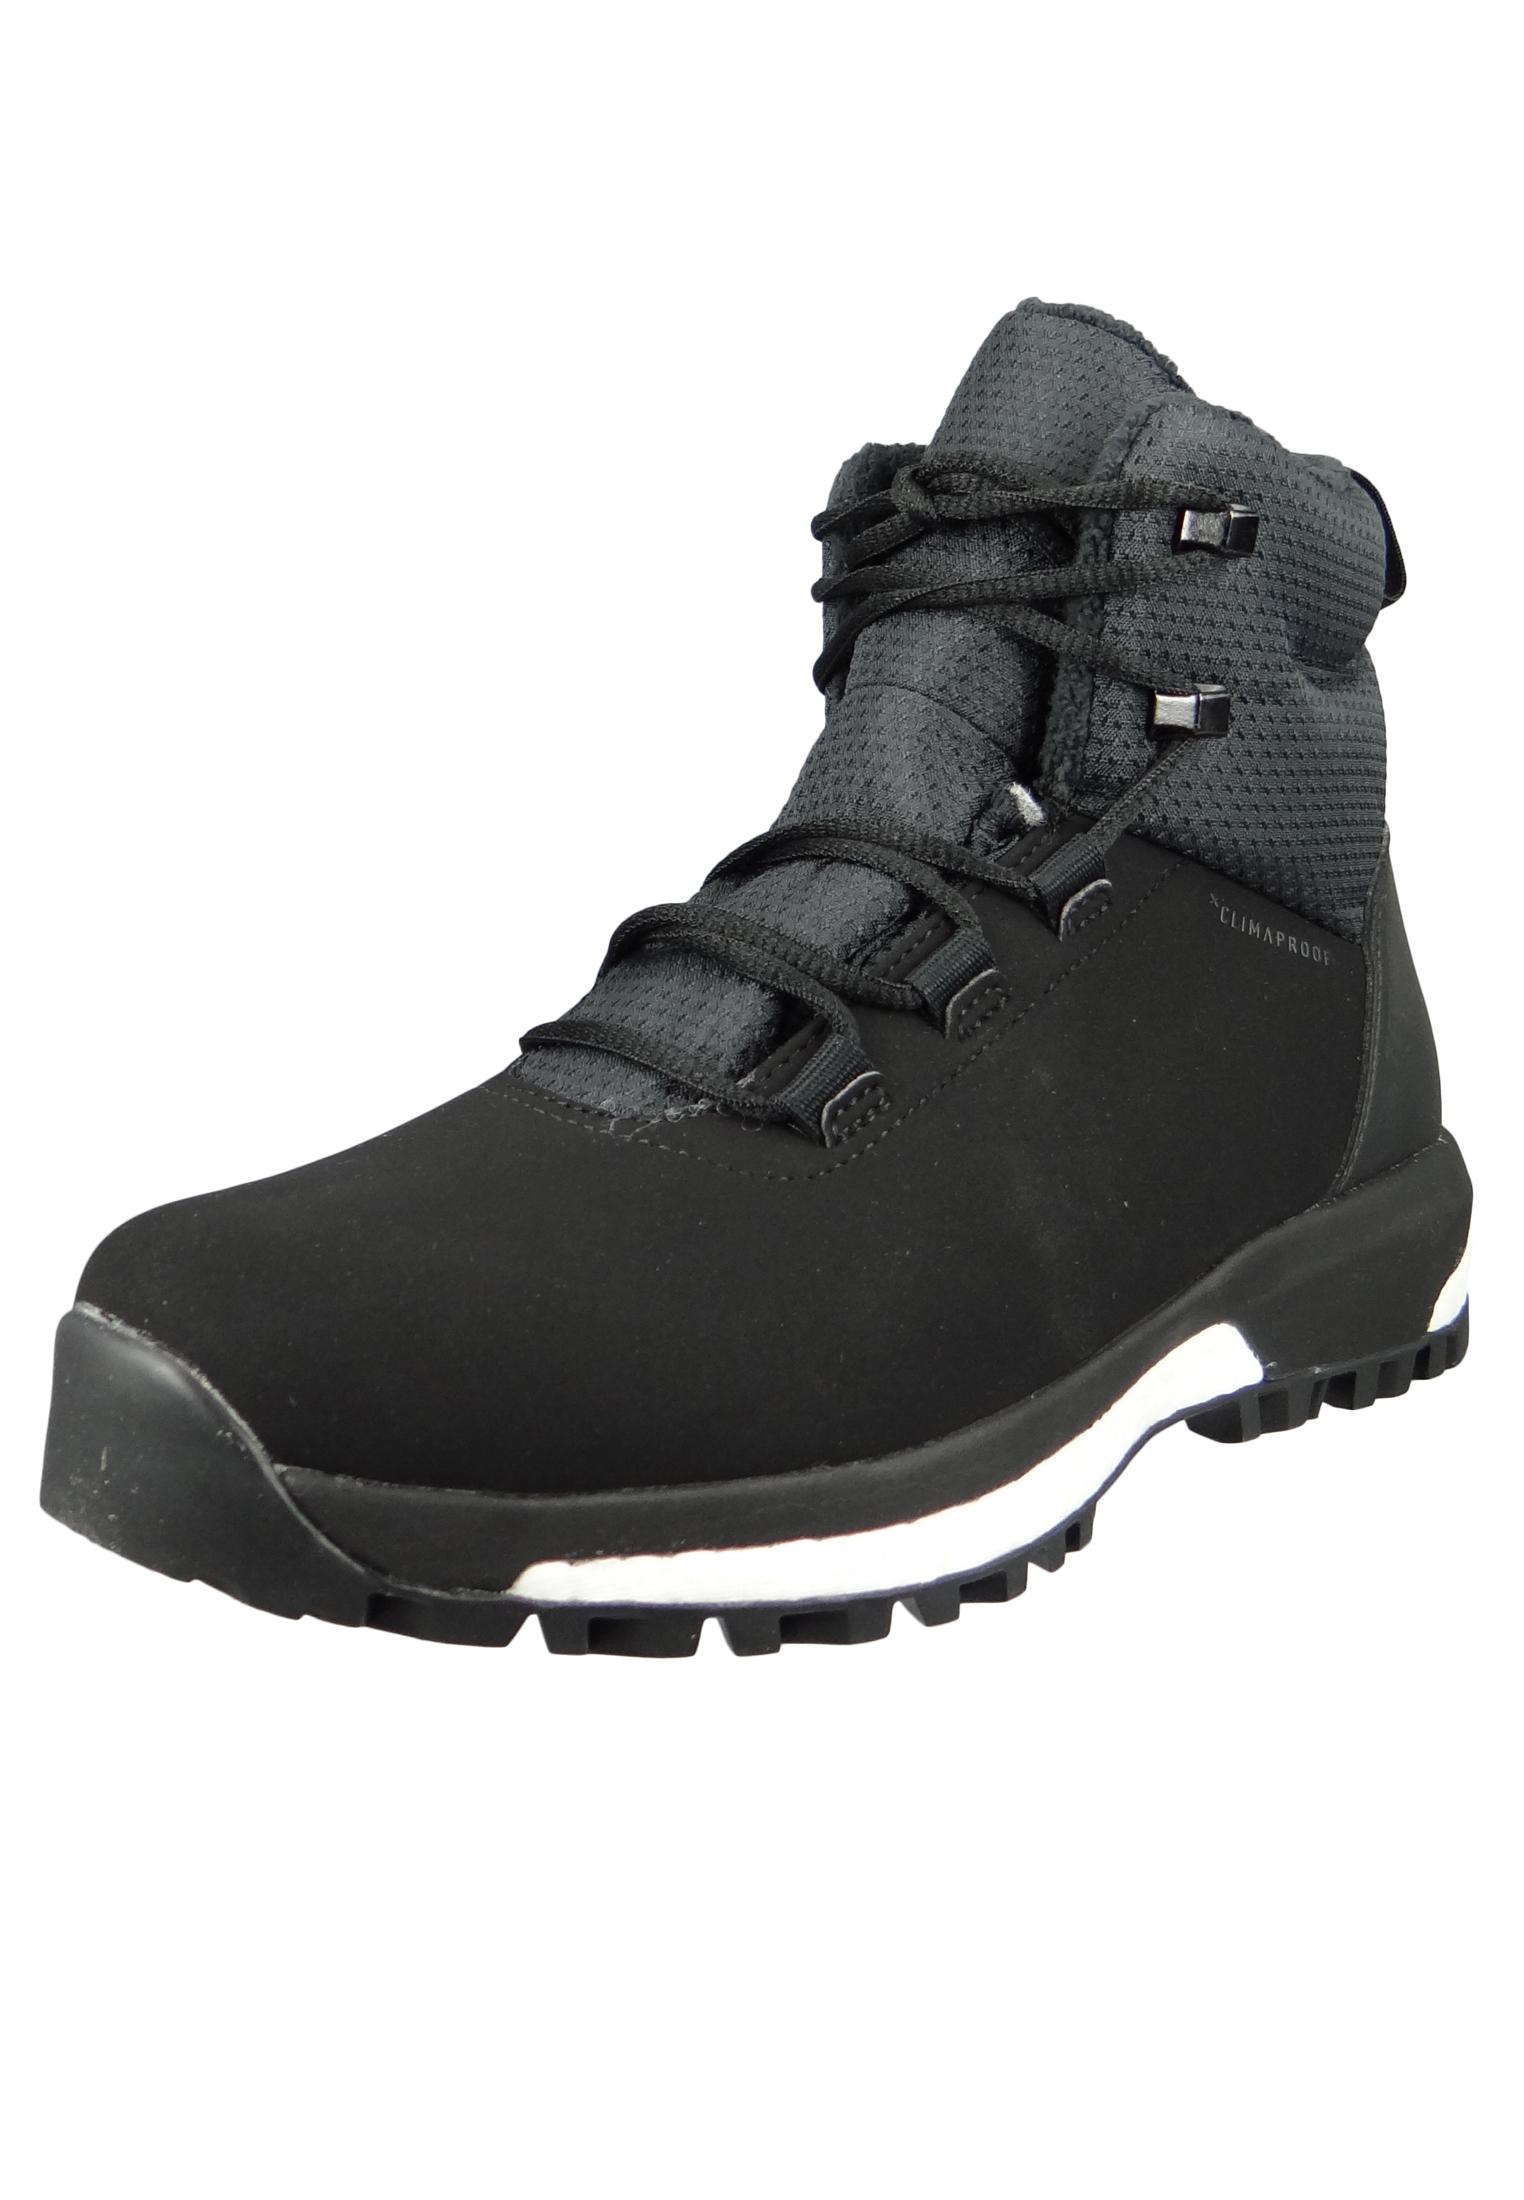 b1607368115 adidas TERREX Pathmaker CP CW W AC7844 Damen Winterstiefel Boots Core Black  Schwarz